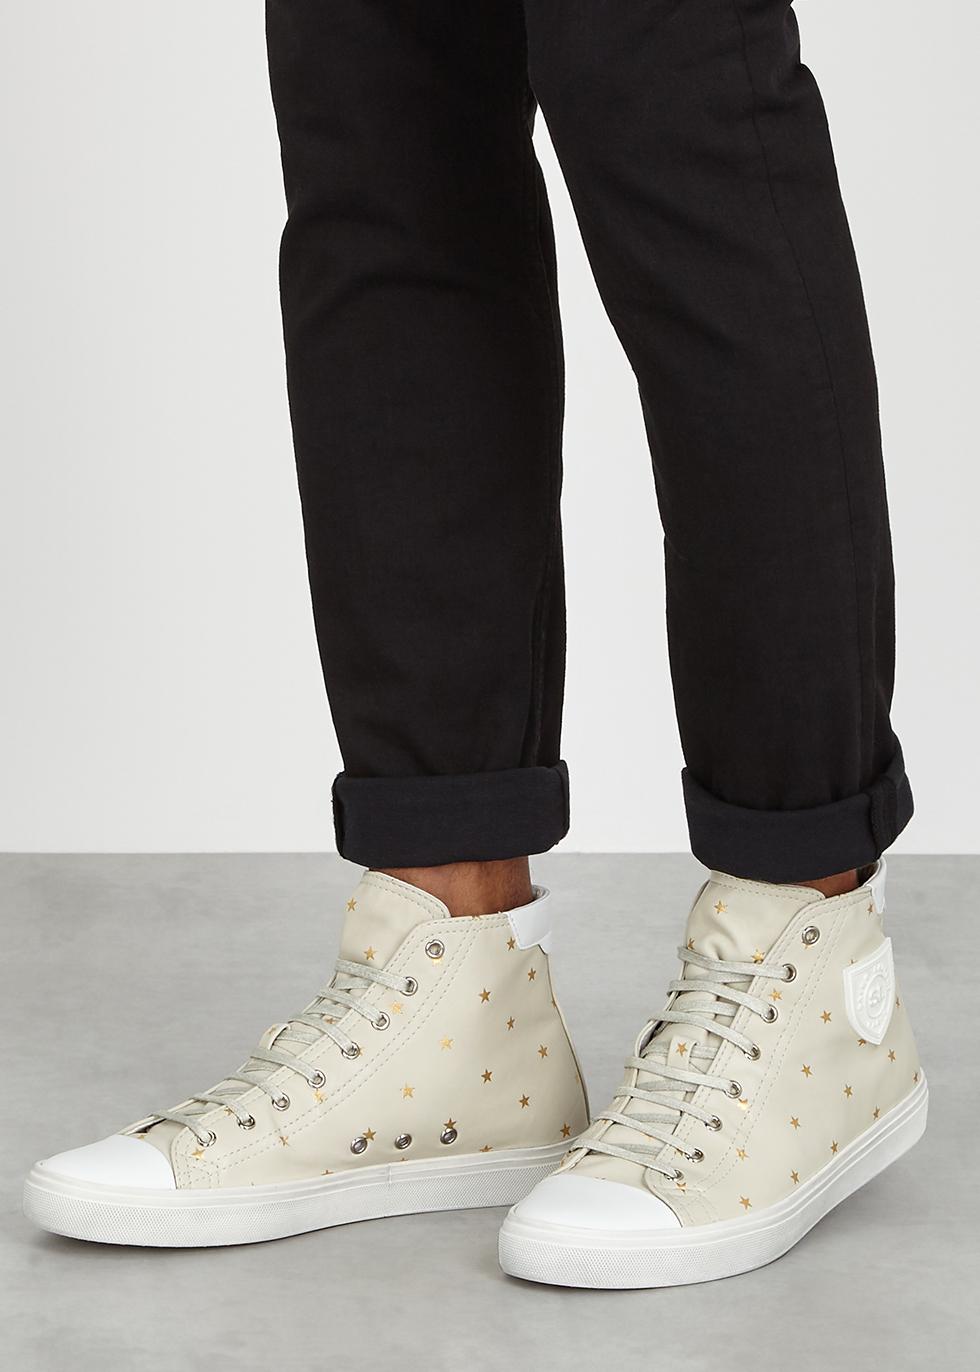 Men's Bedford Star Print High Top Sneakers